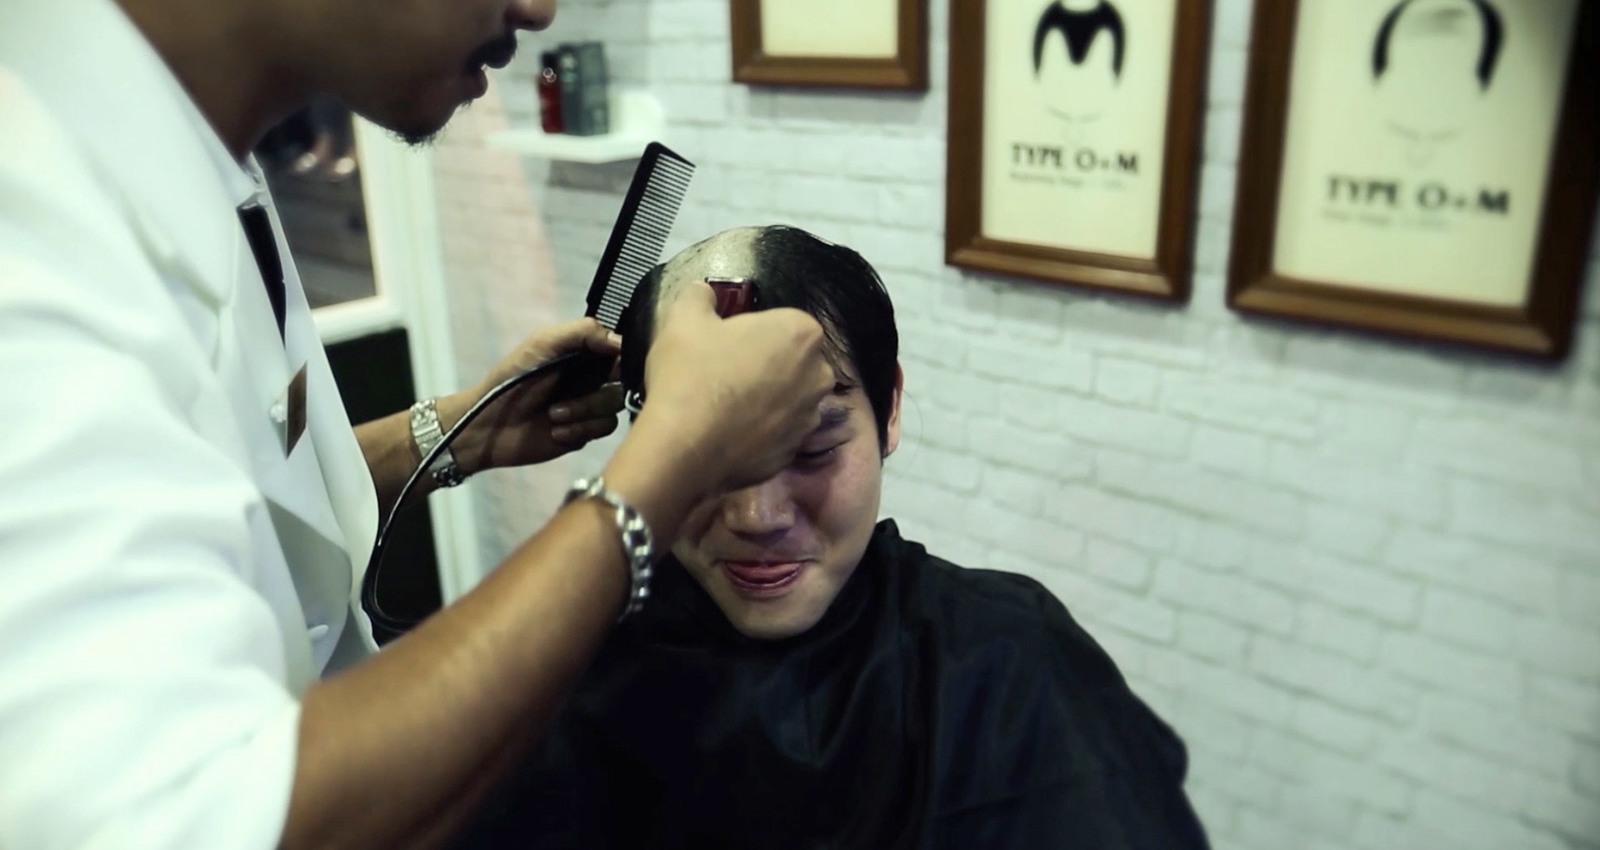 Bald Barbershop